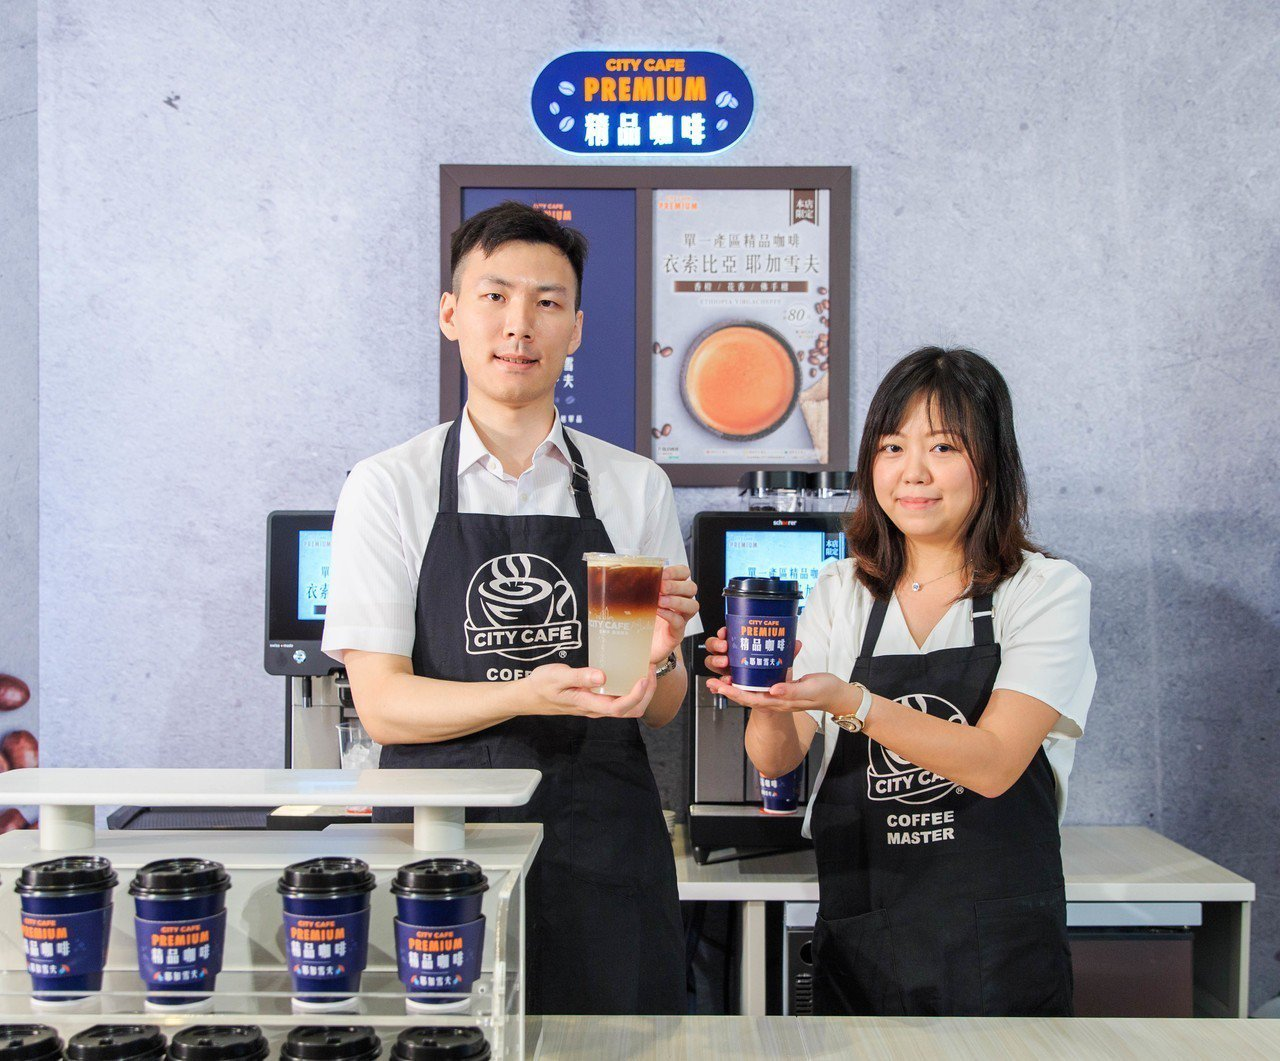 7-ELEVEN精品咖啡品牌「CITY CAFE PREMIUM精品咖啡」版圖將...